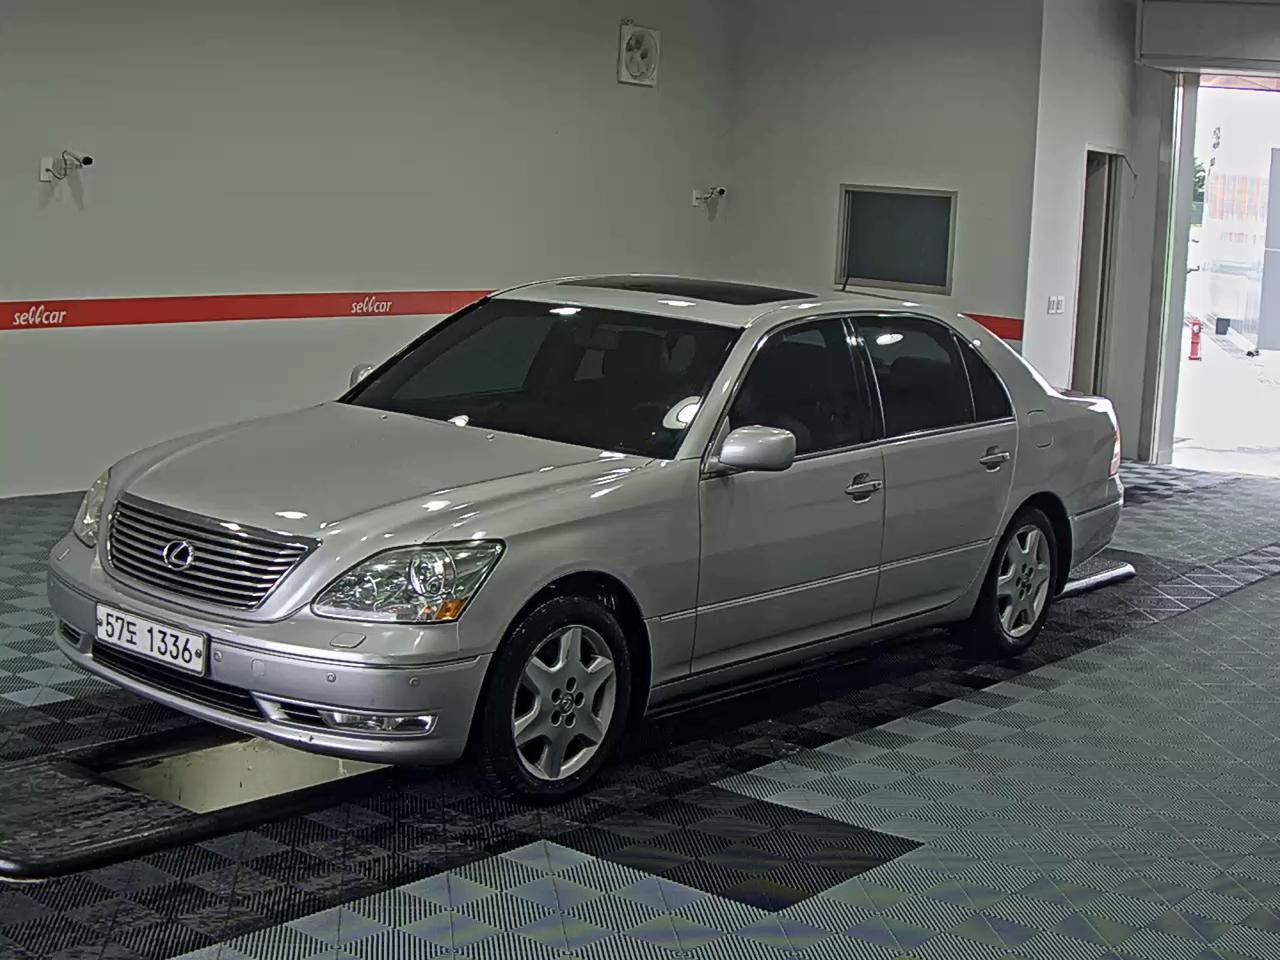 0141 Lexus LS430 STD XF30 20006